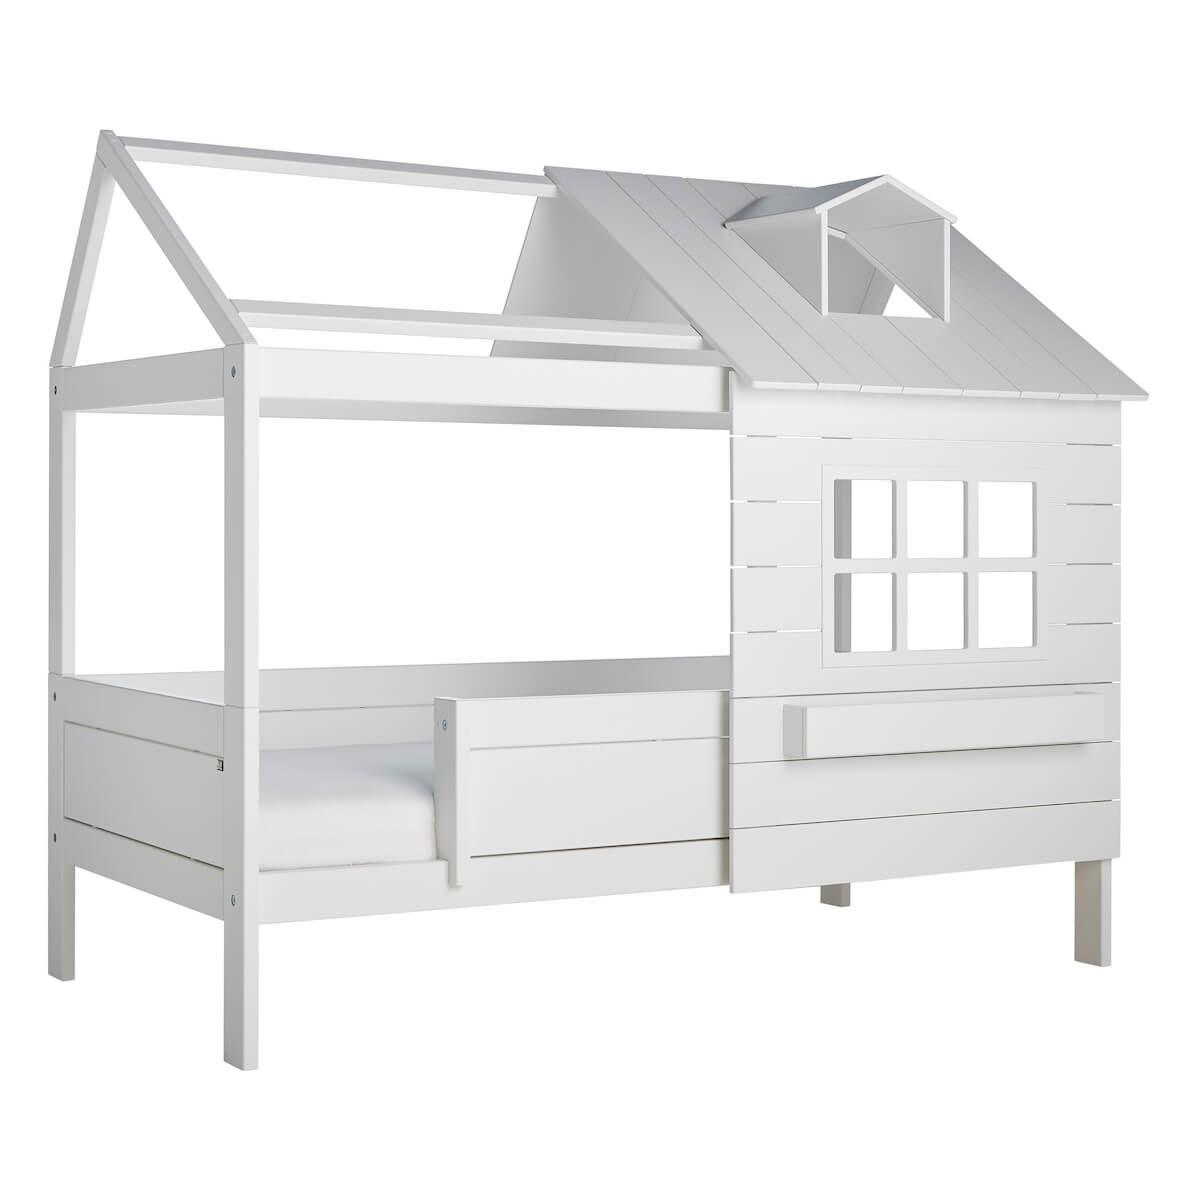 Cama cabaña LAKE HOUSE 1 Lifetime blanco